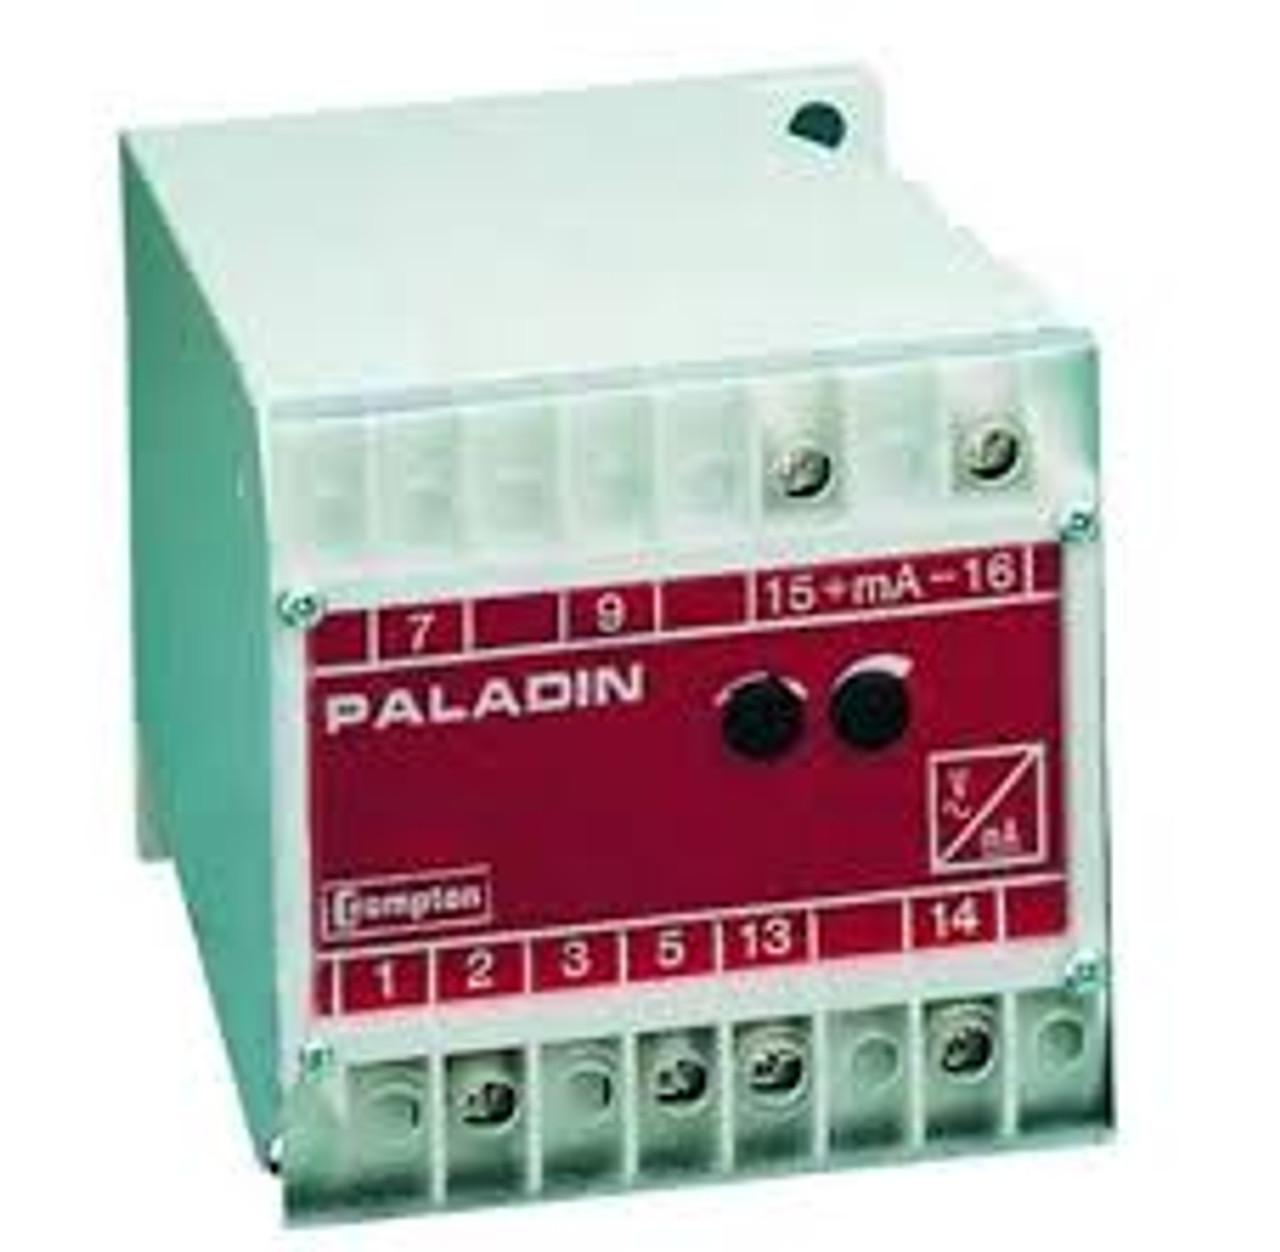 CROMPTON 256-TWMU-QQFA-C6 PALADIN AC POWER TRANSDUCERS